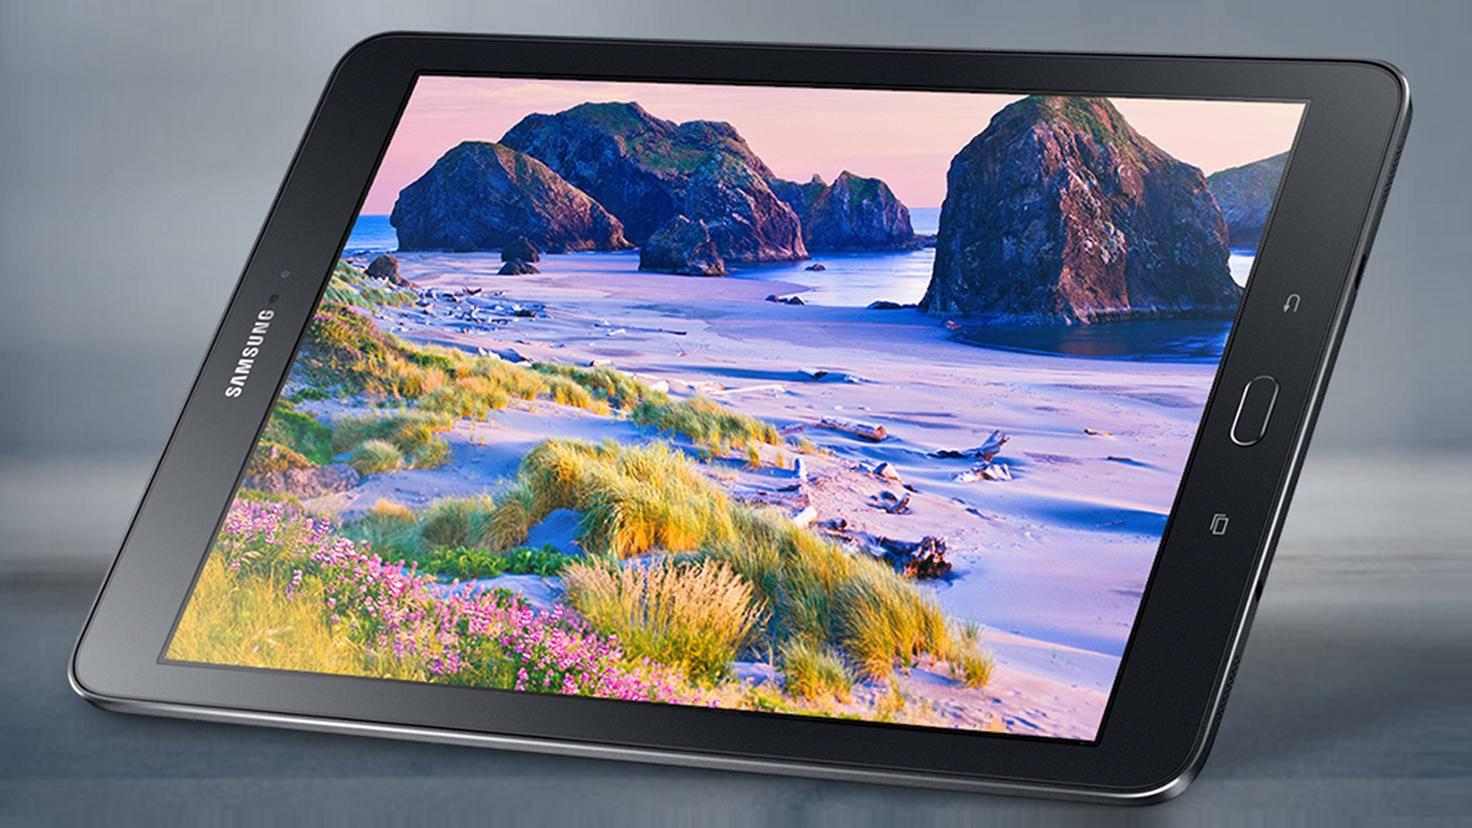 Das Galaxy Tab S2